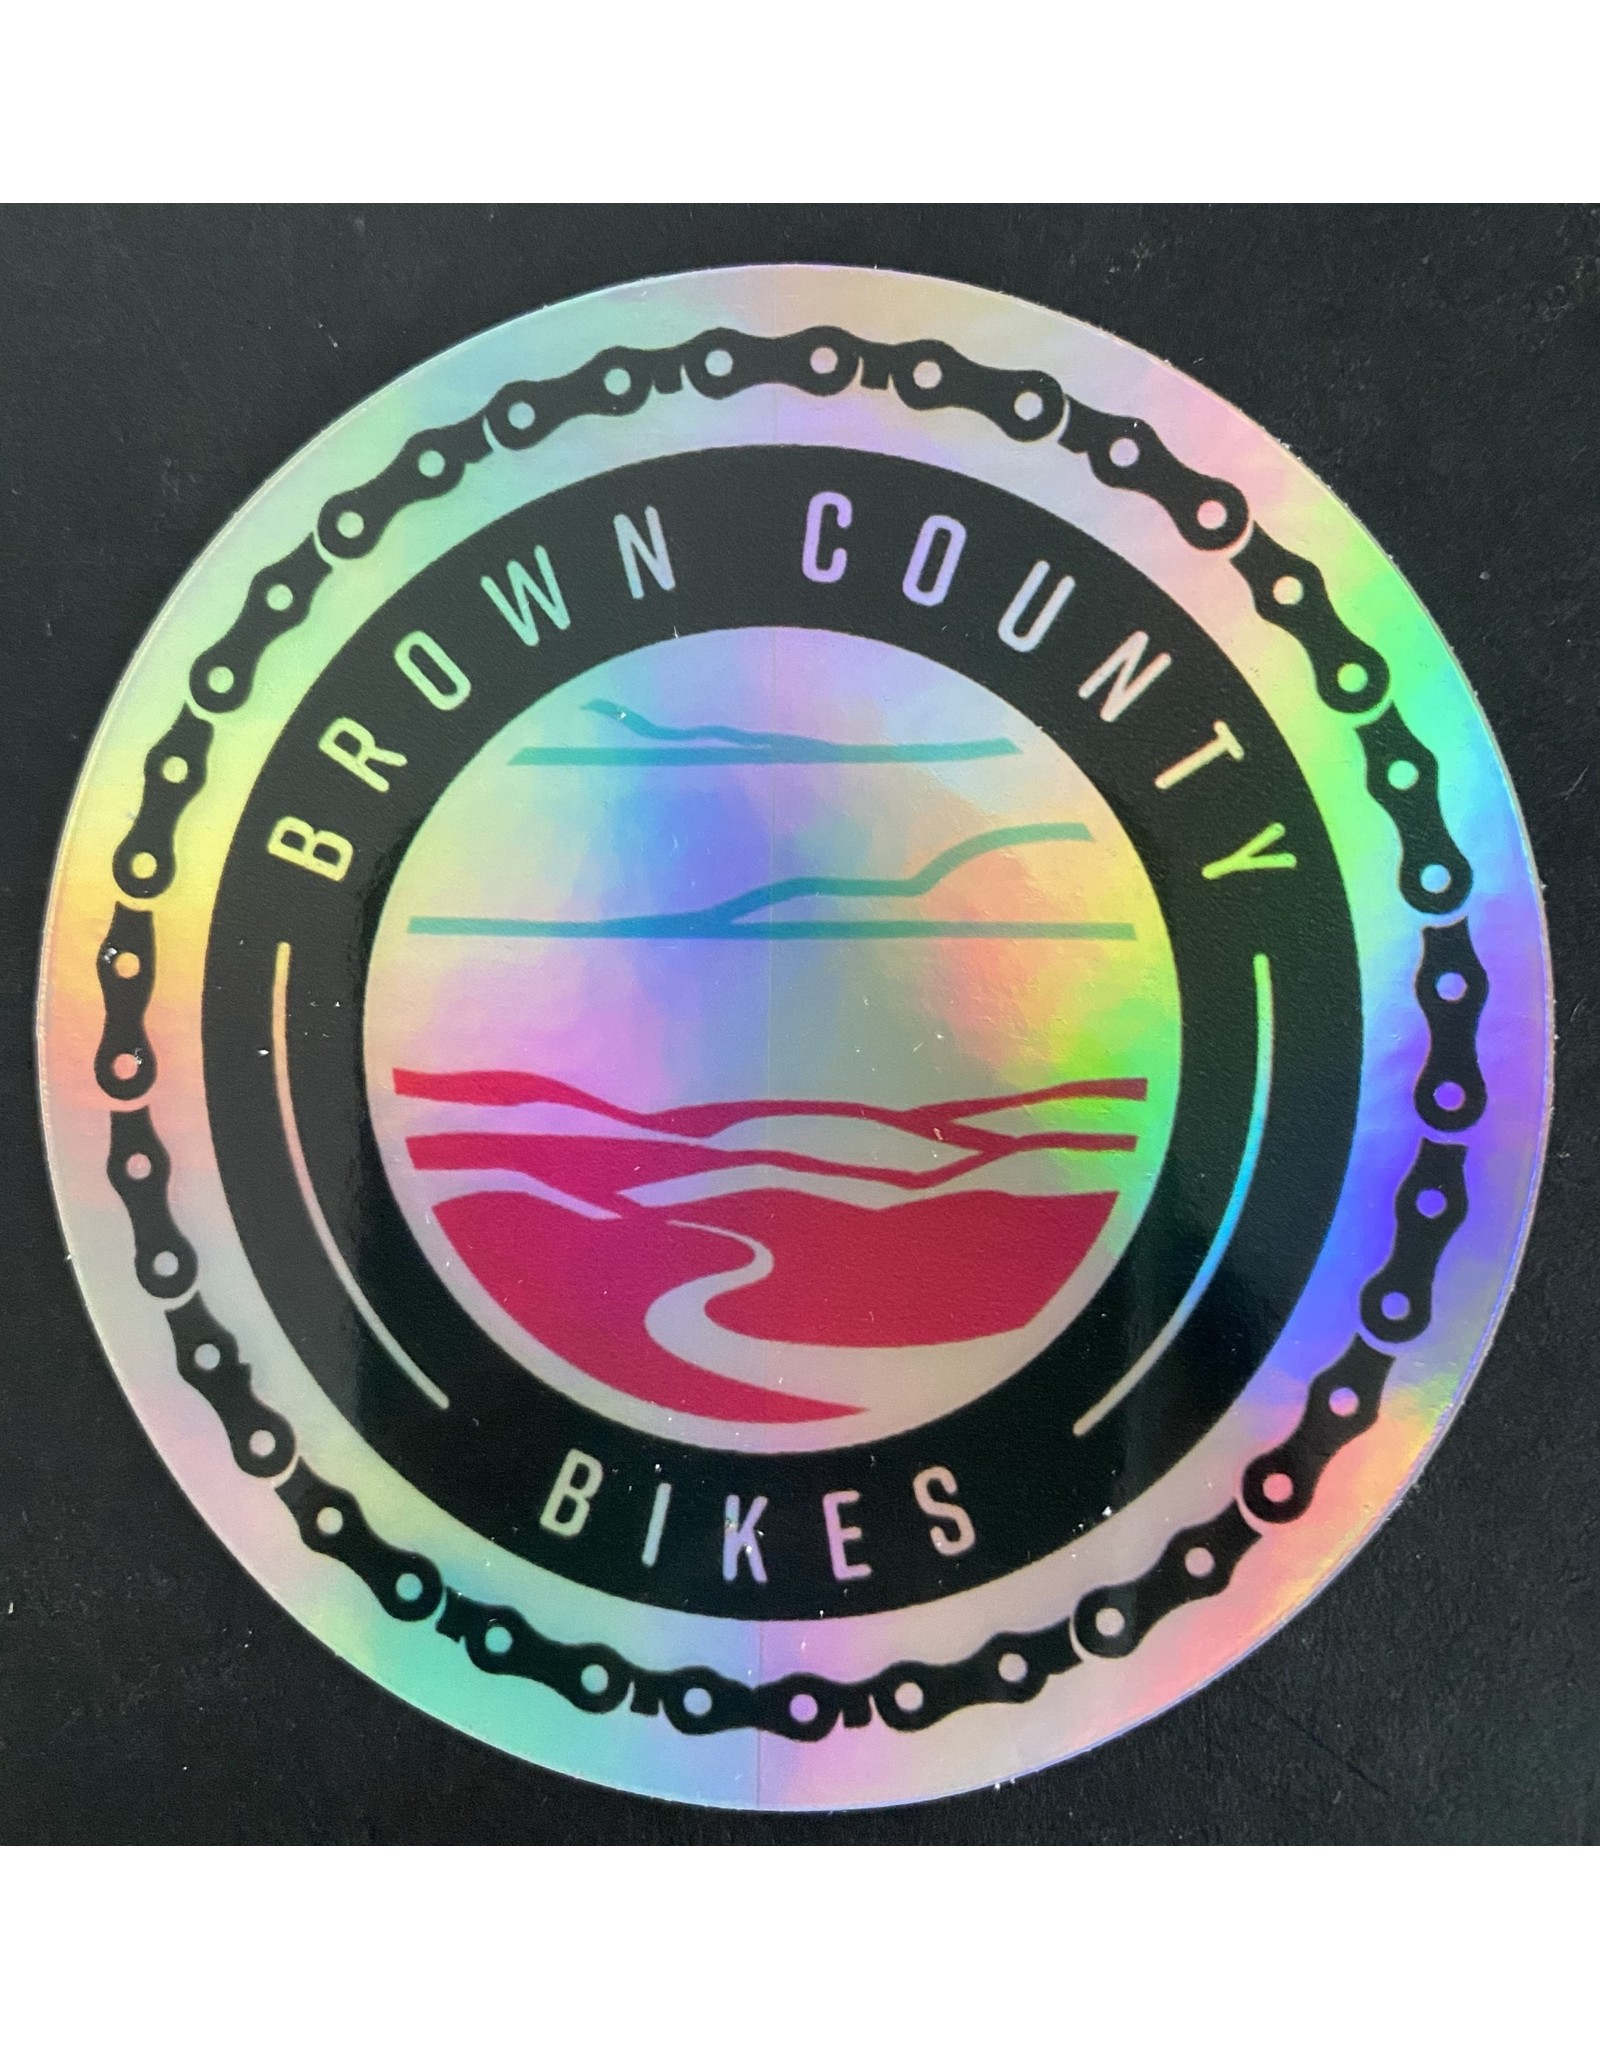 Custom Brown County Bikes Gear Brown County Bikes Hologram Sticker